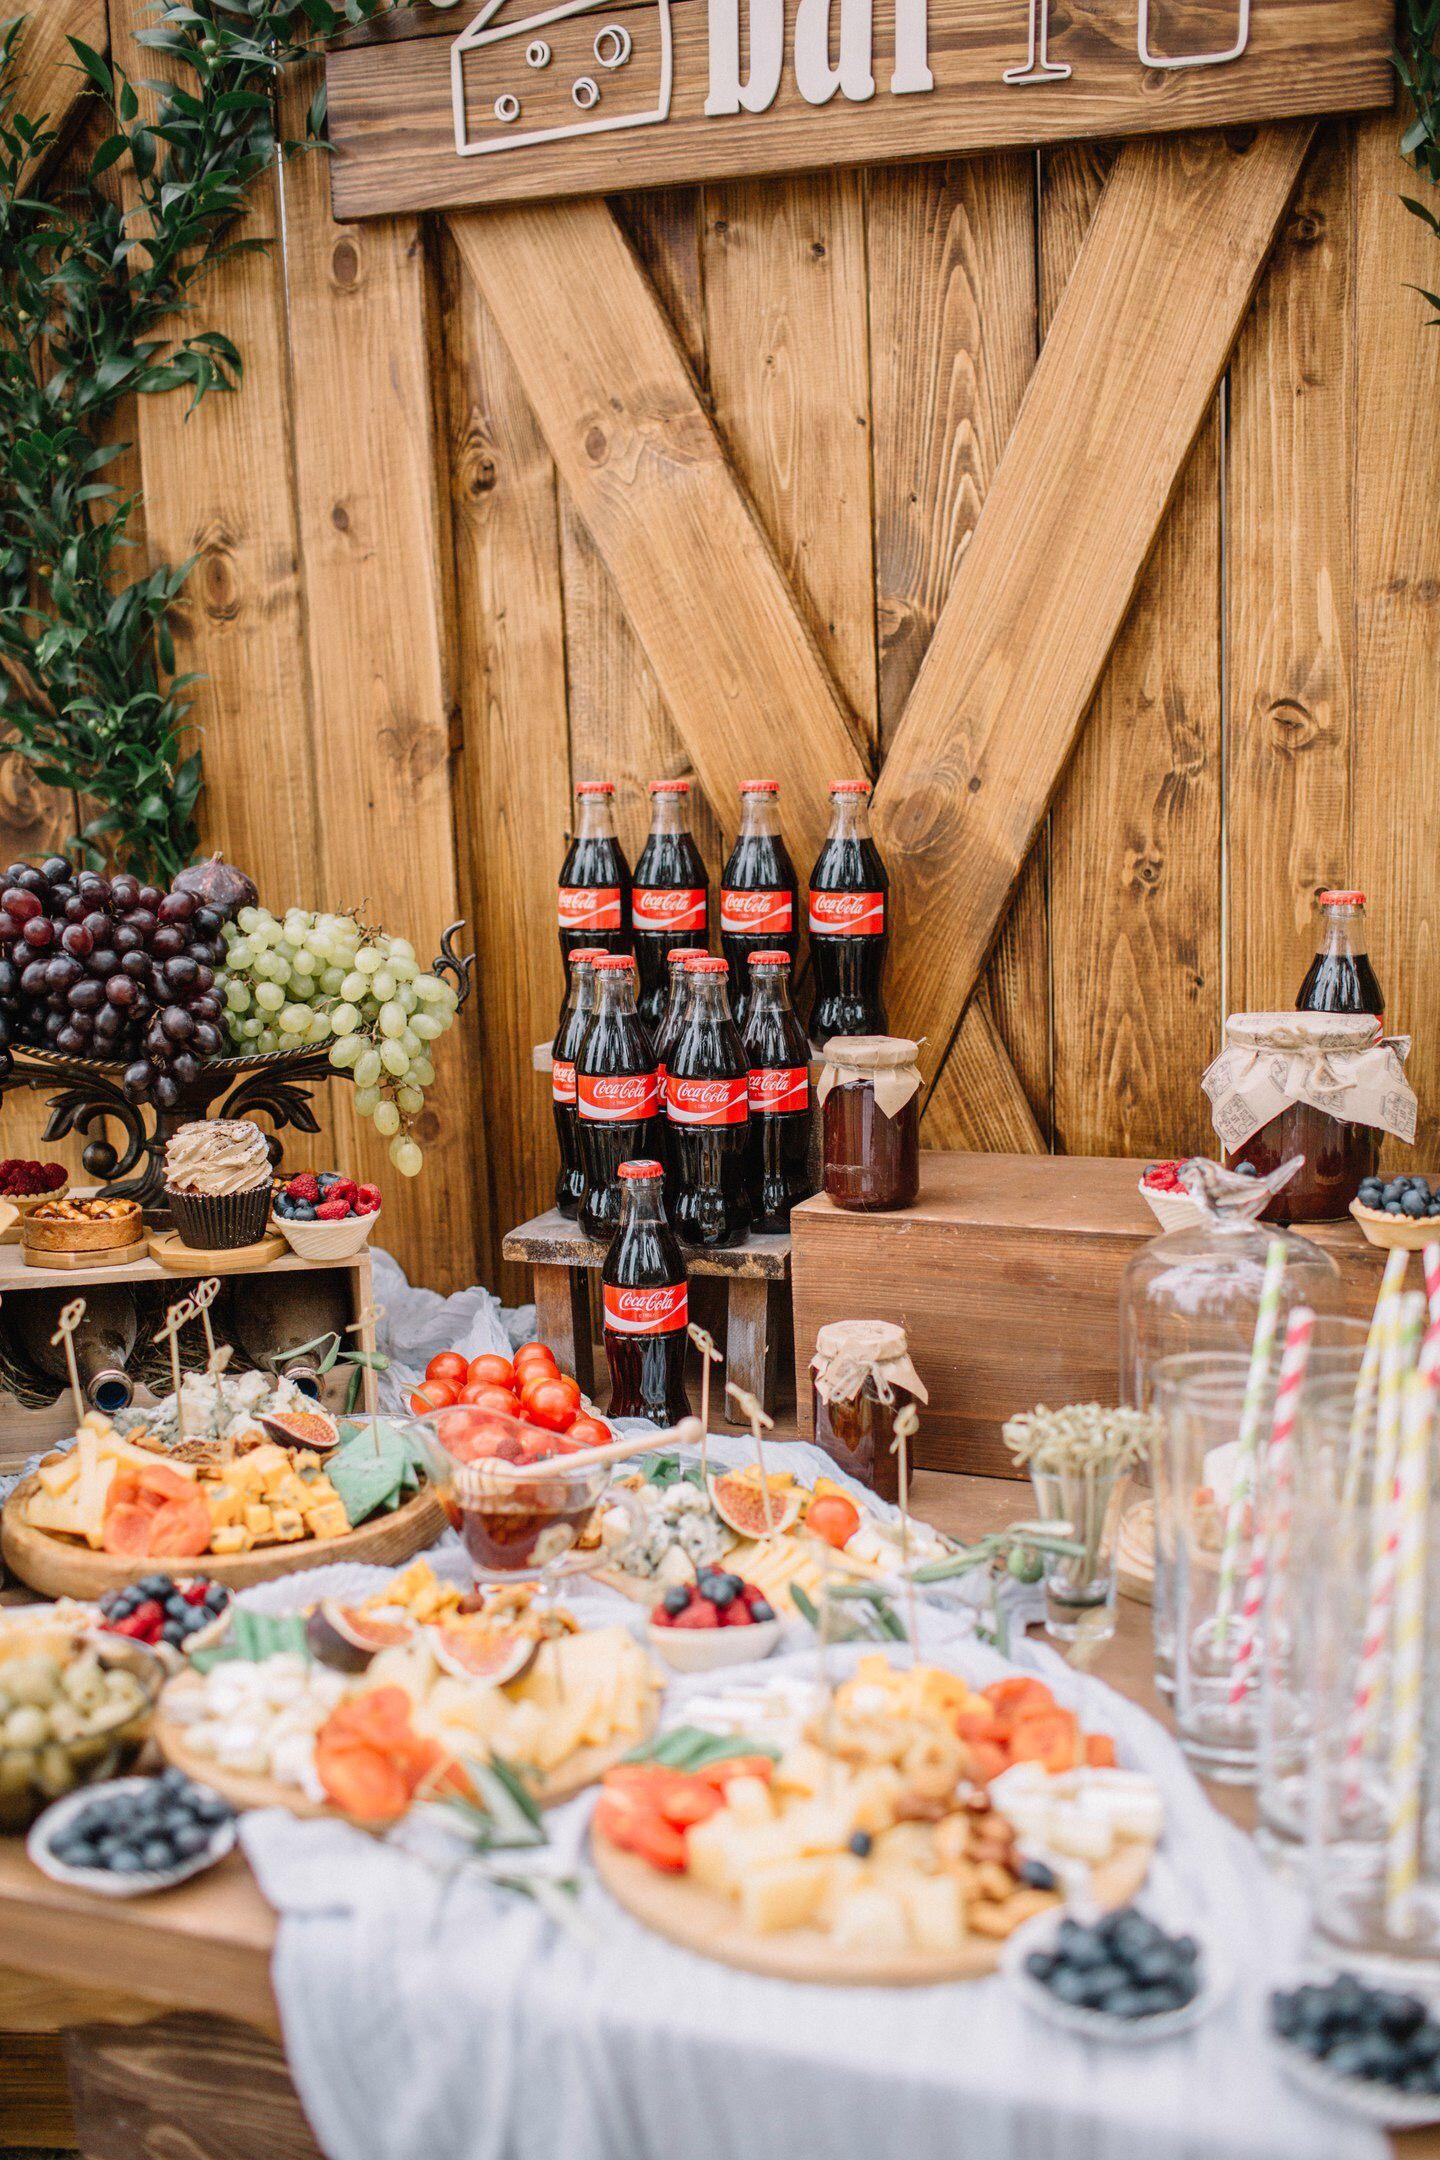 0dc13aeb26025779a62feec3daedf943 Incroyable De Table Bar Cuisine Conception